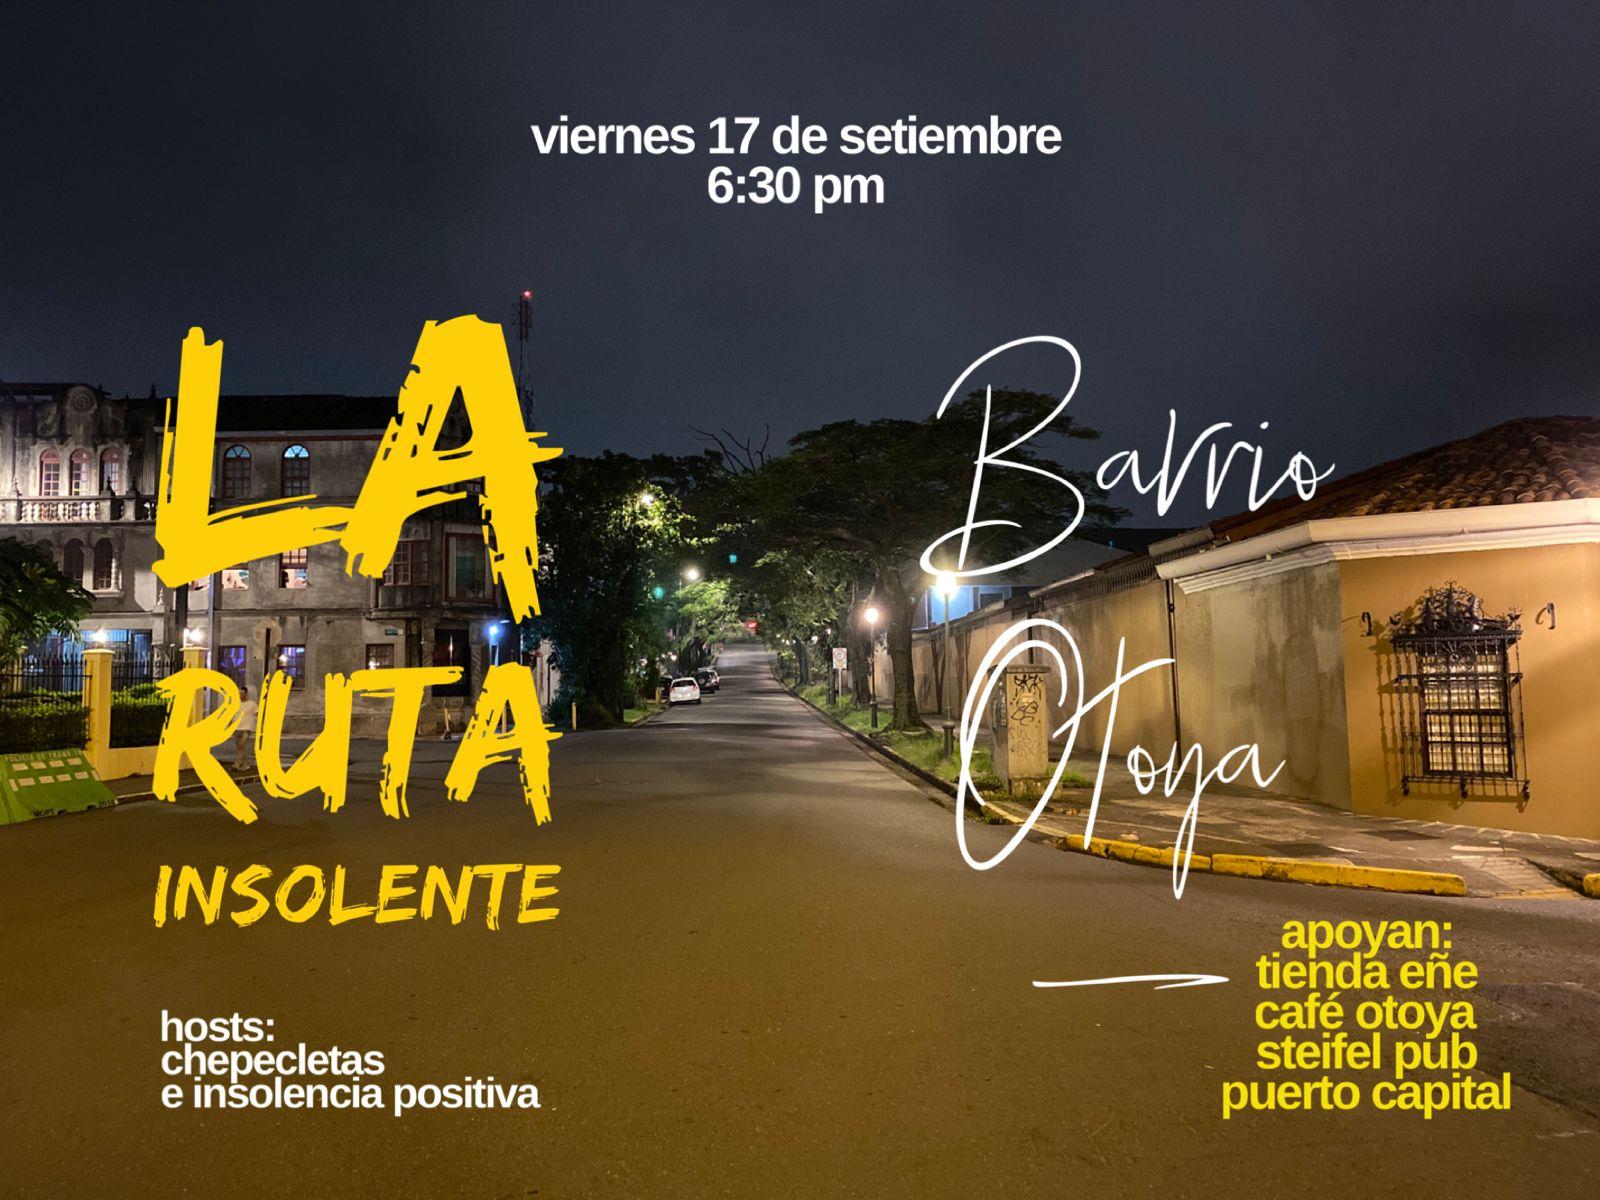 La Ruta Insolente, Barrio Otoya - Caminata Nocturna